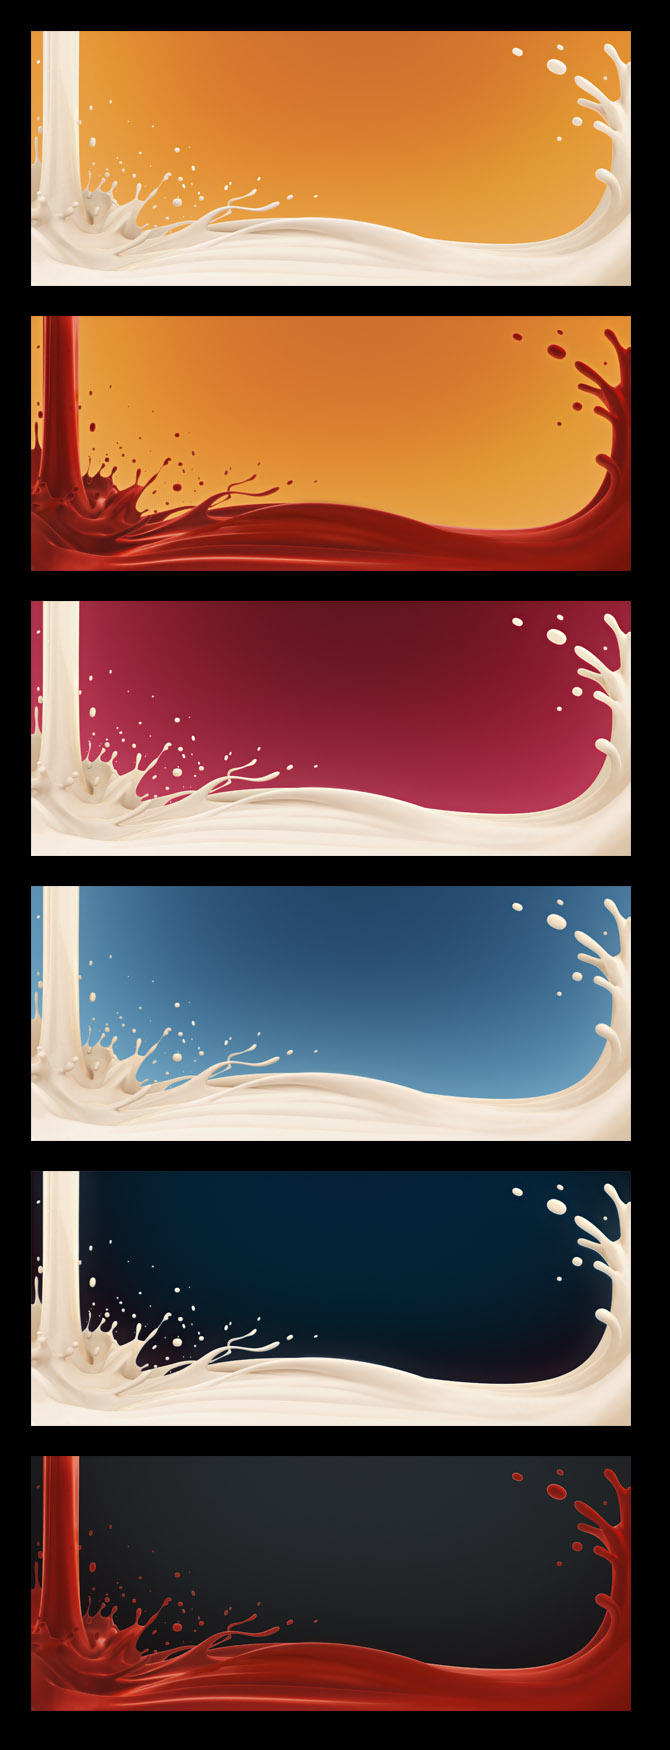 Splash - 3760x1600 wallpaper by maxon